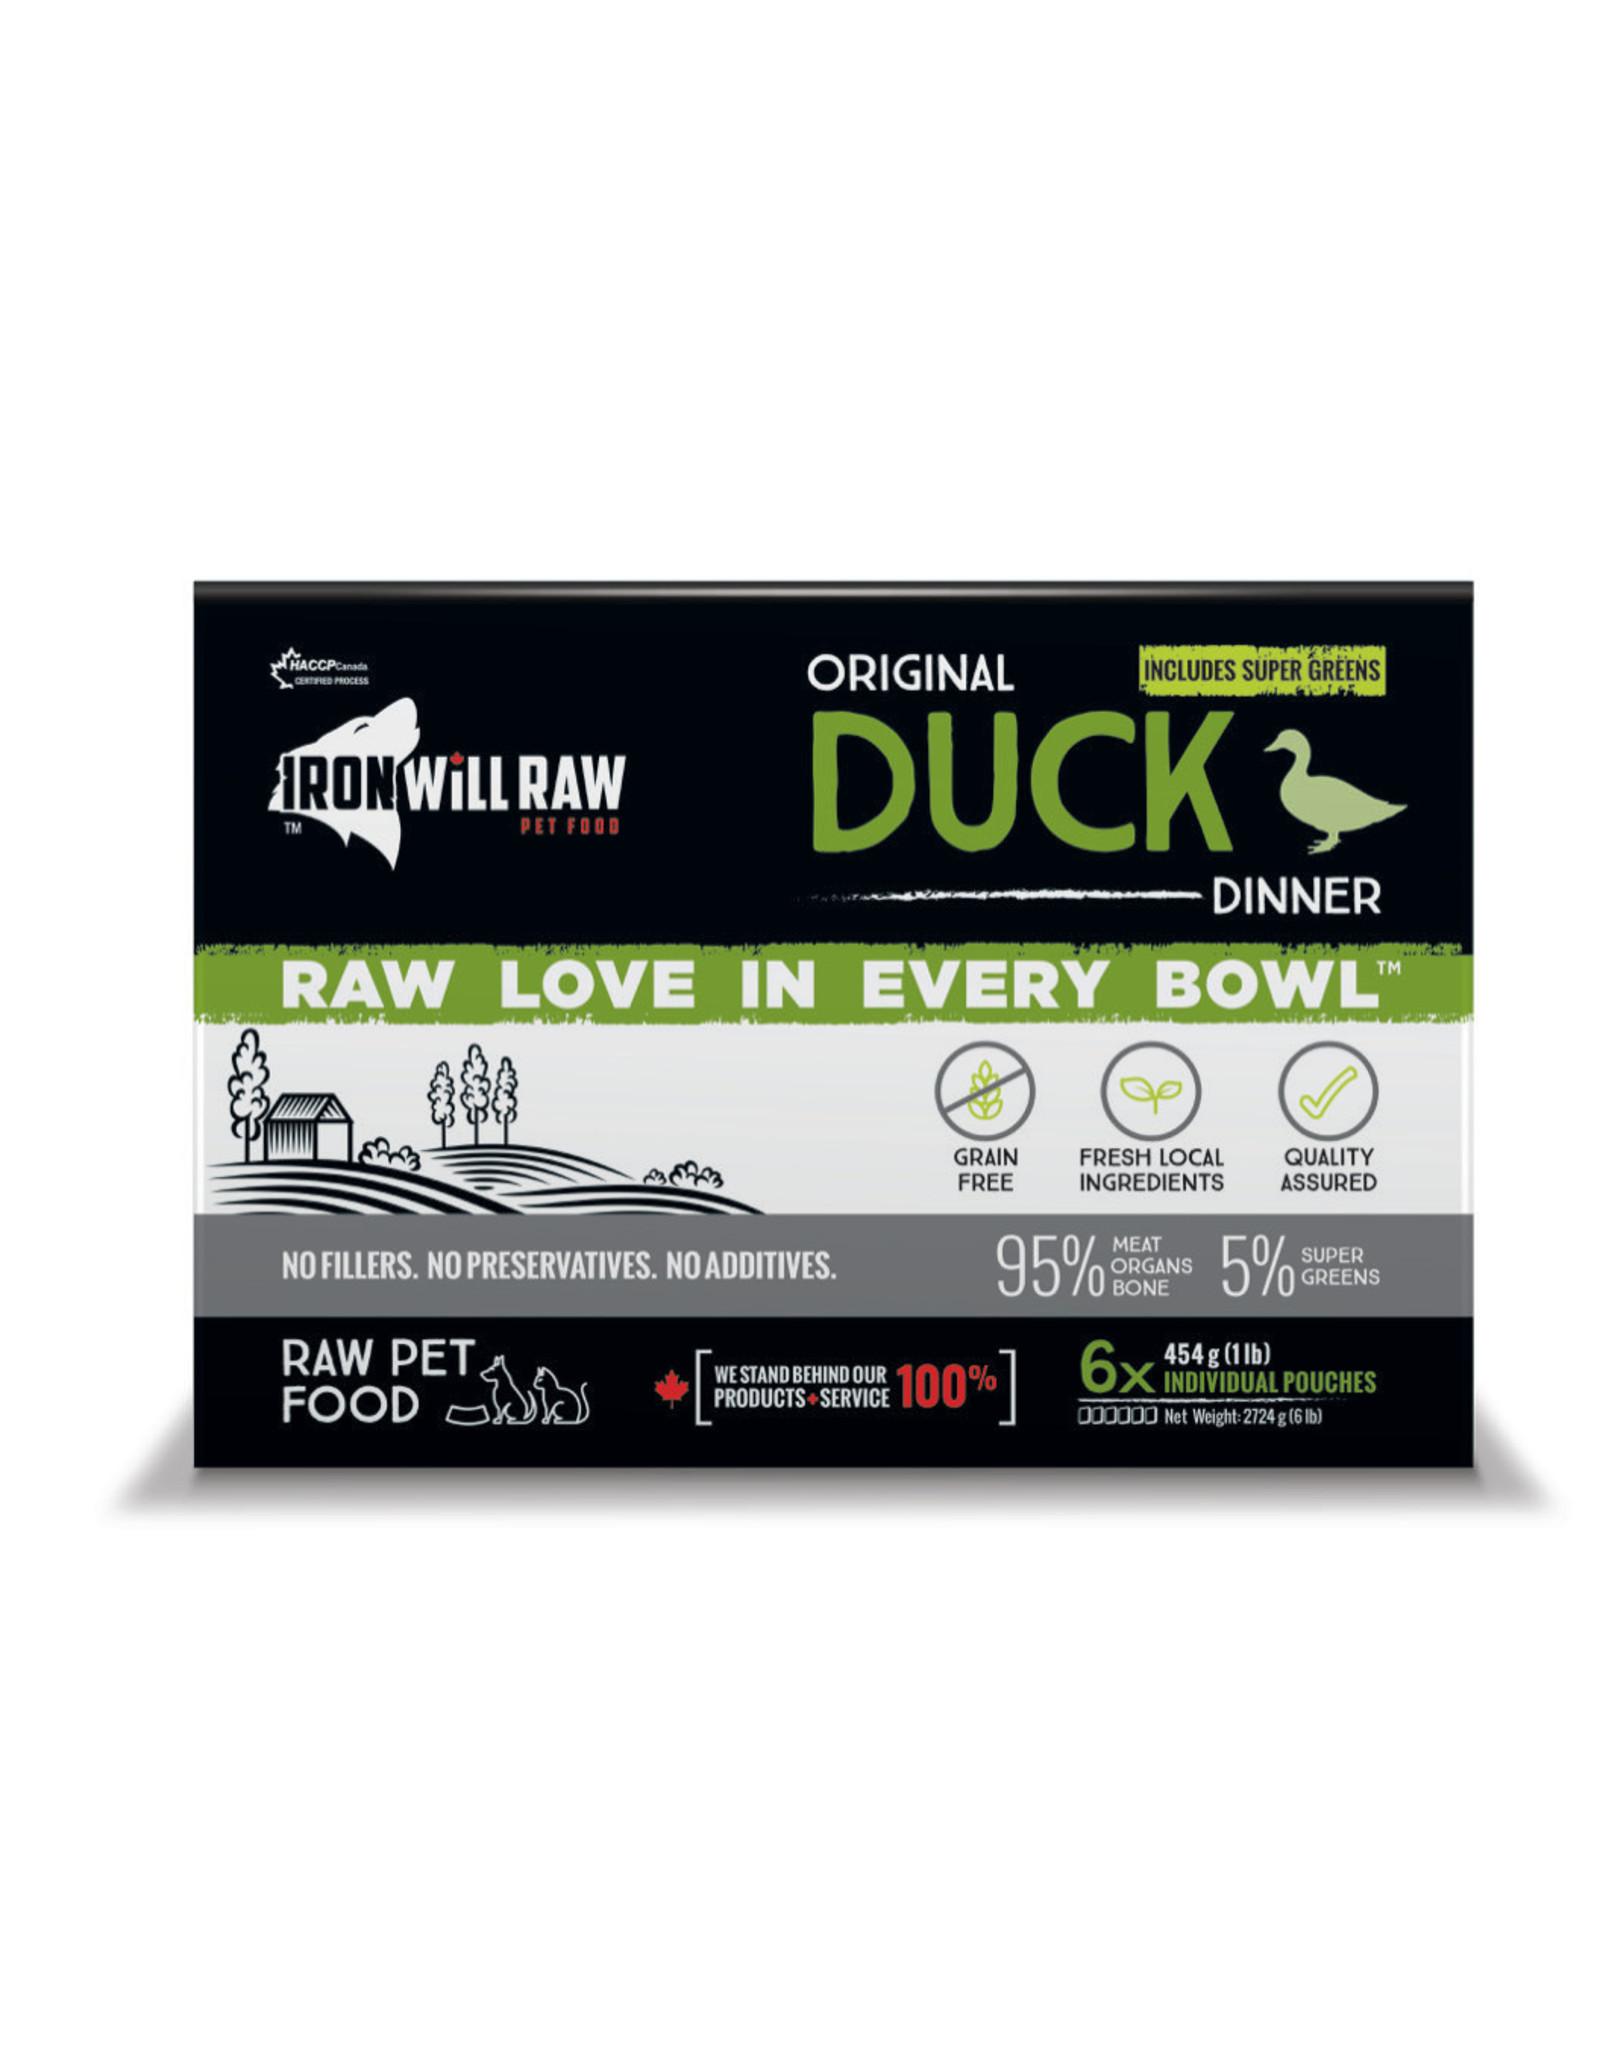 Iron Will Raw Iron Will Raw - Original Duck 6LB